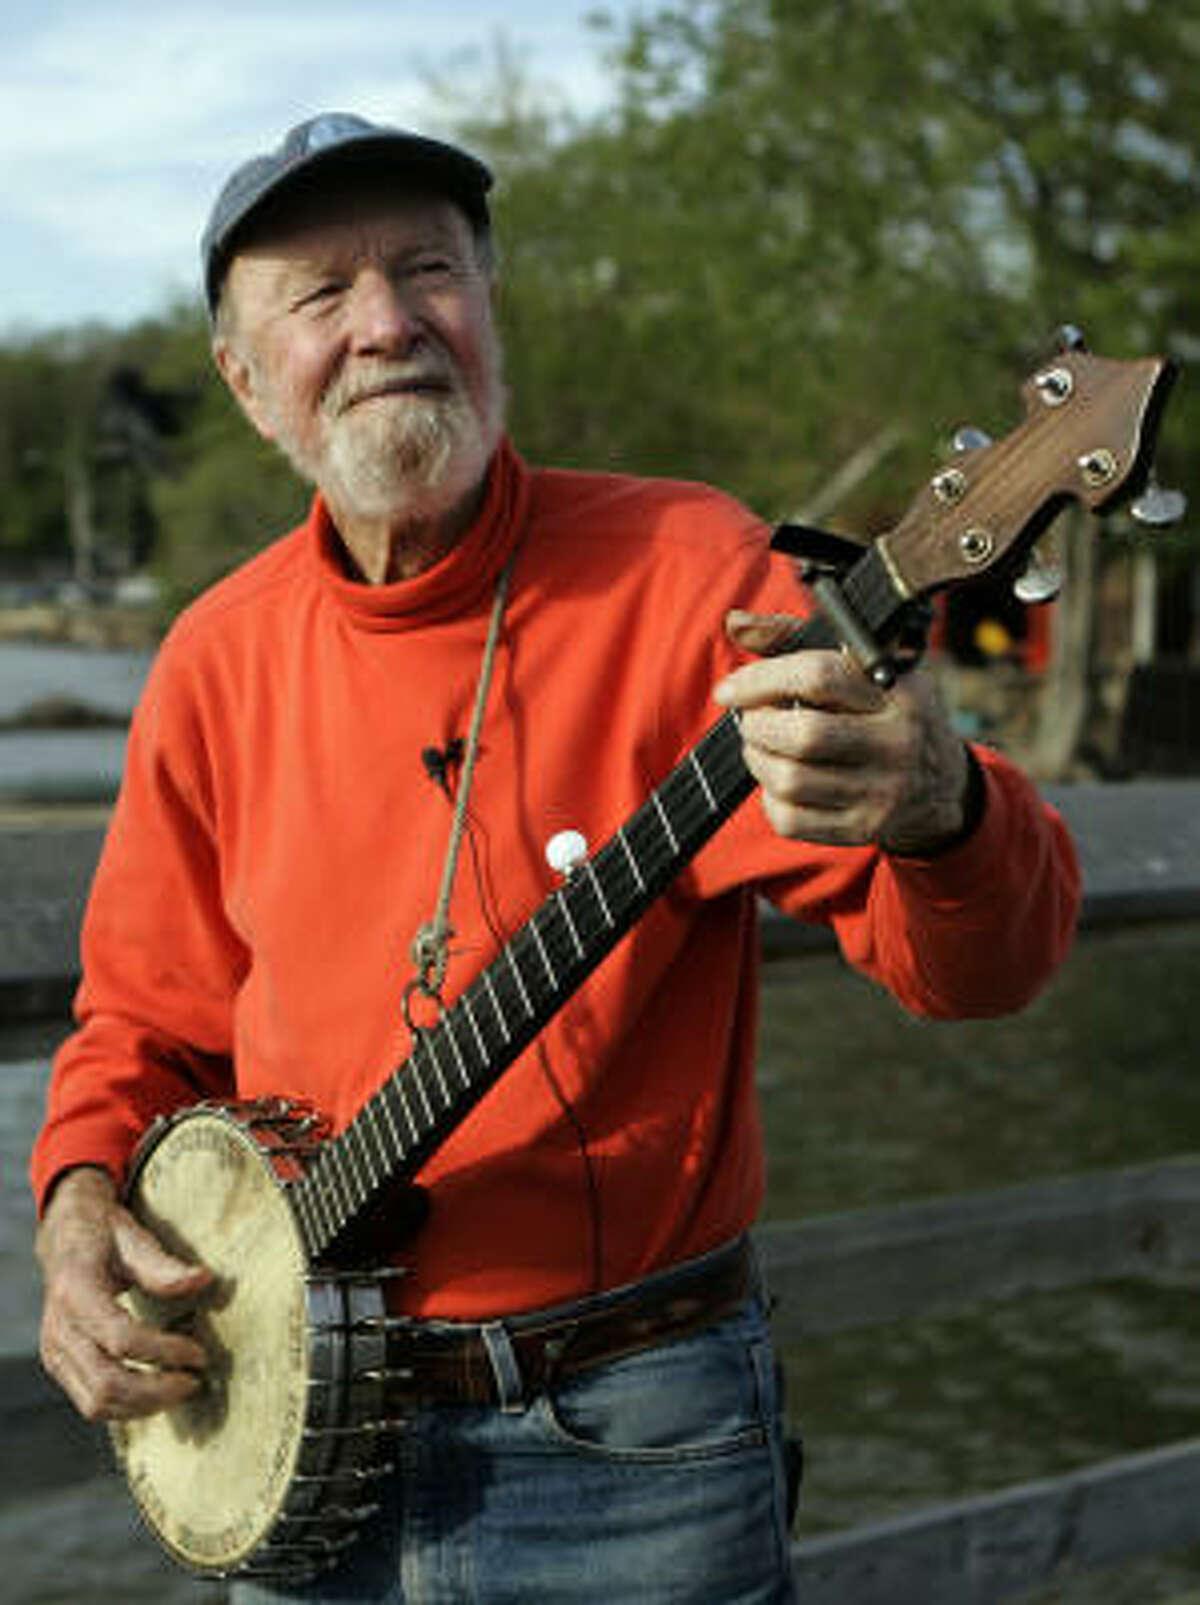 Nearing 90, folk singer Pete Seeger still sings, but a new set of CDs preserves his earlier, stronger voice.